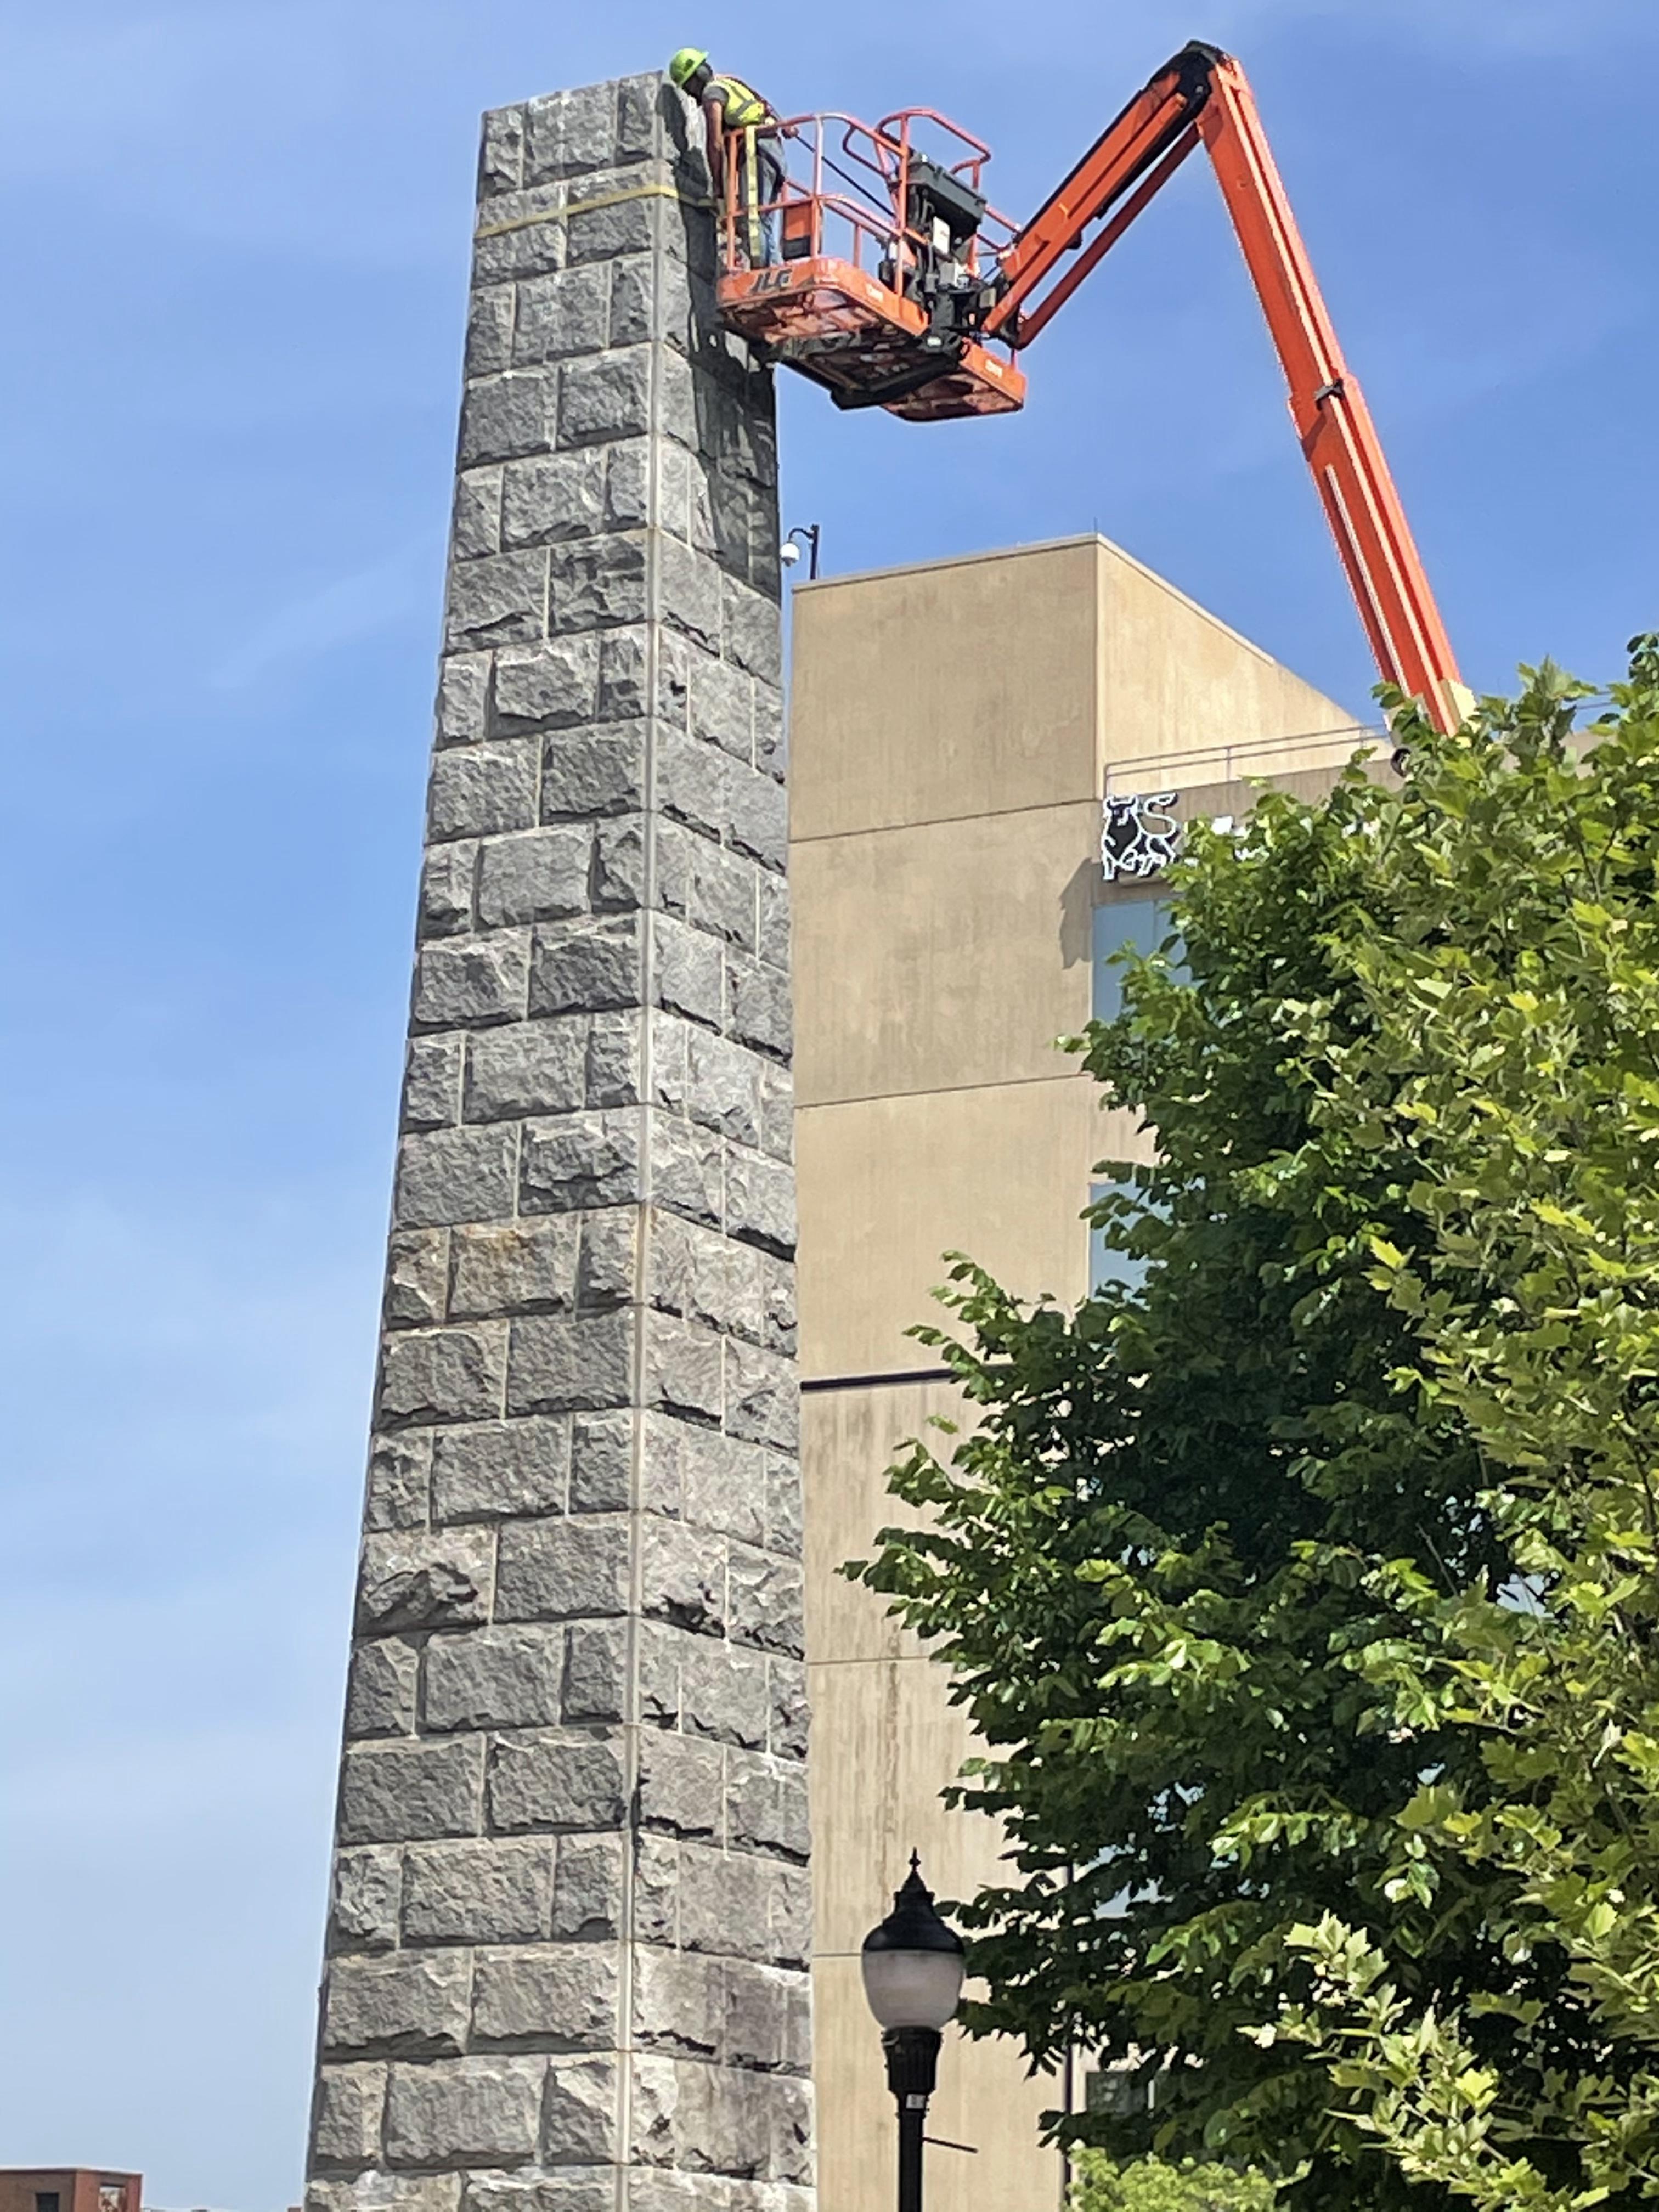 Sky, Tree, Building, Brickwork